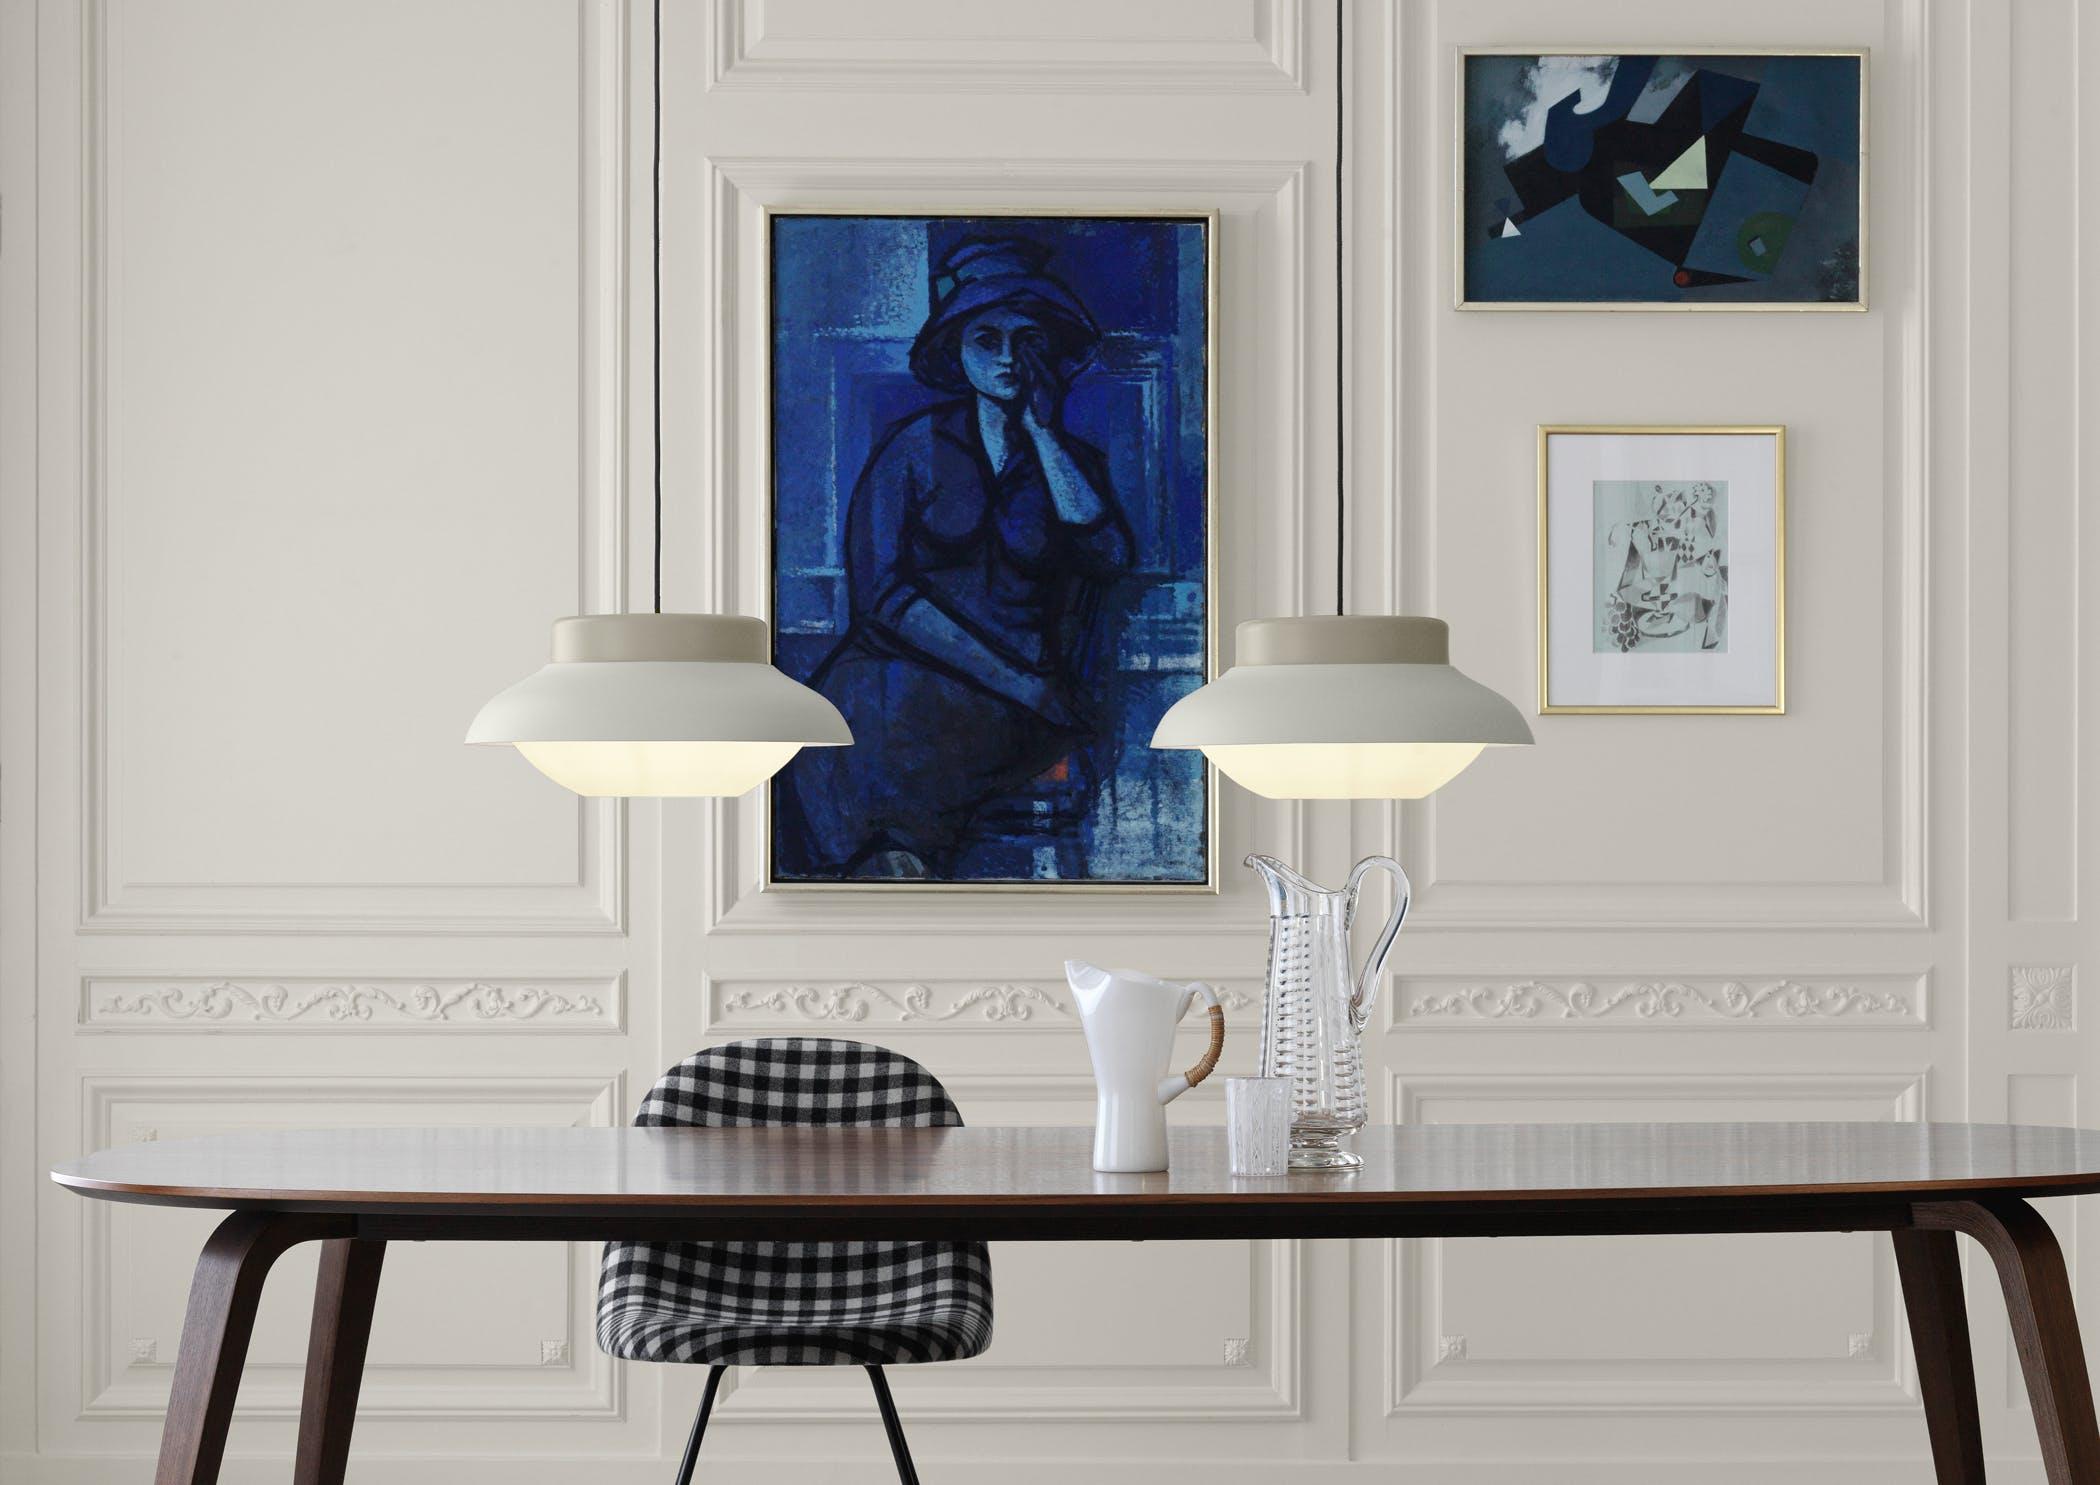 Collar Lamps Large Sand Gubi Dining Table Elliptical Walnut Gubi 12 F 13 F Chair Backhausen Toni N0354710